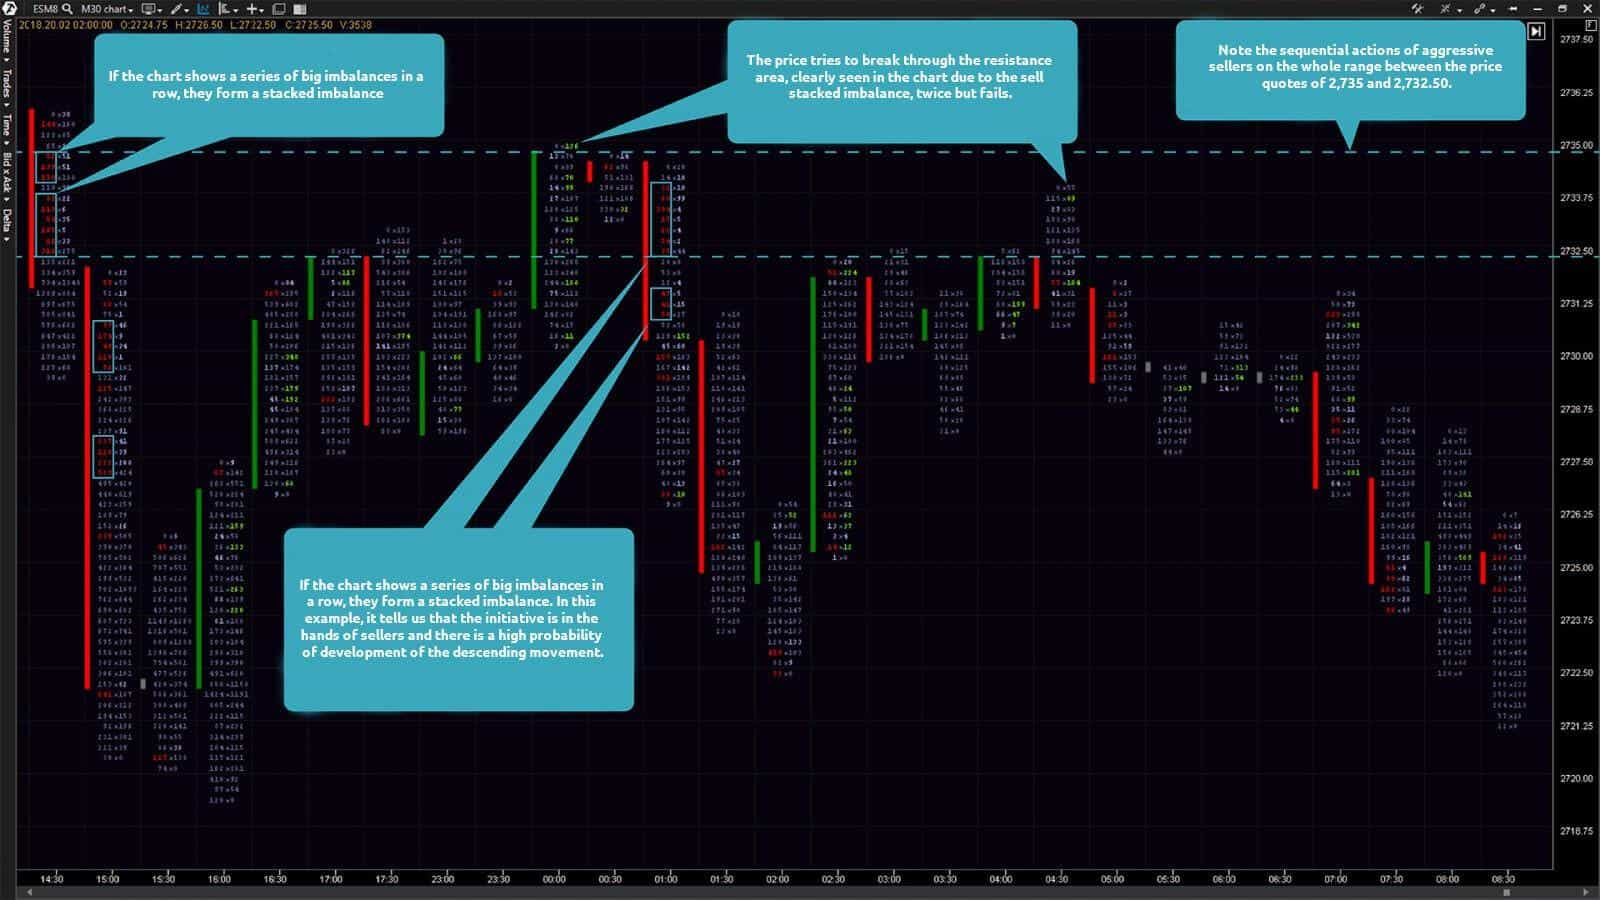 30-minute chart of an E-mini S&P 500 futures (ticker: ES). The Bid x Ask Imbalance footprint chart